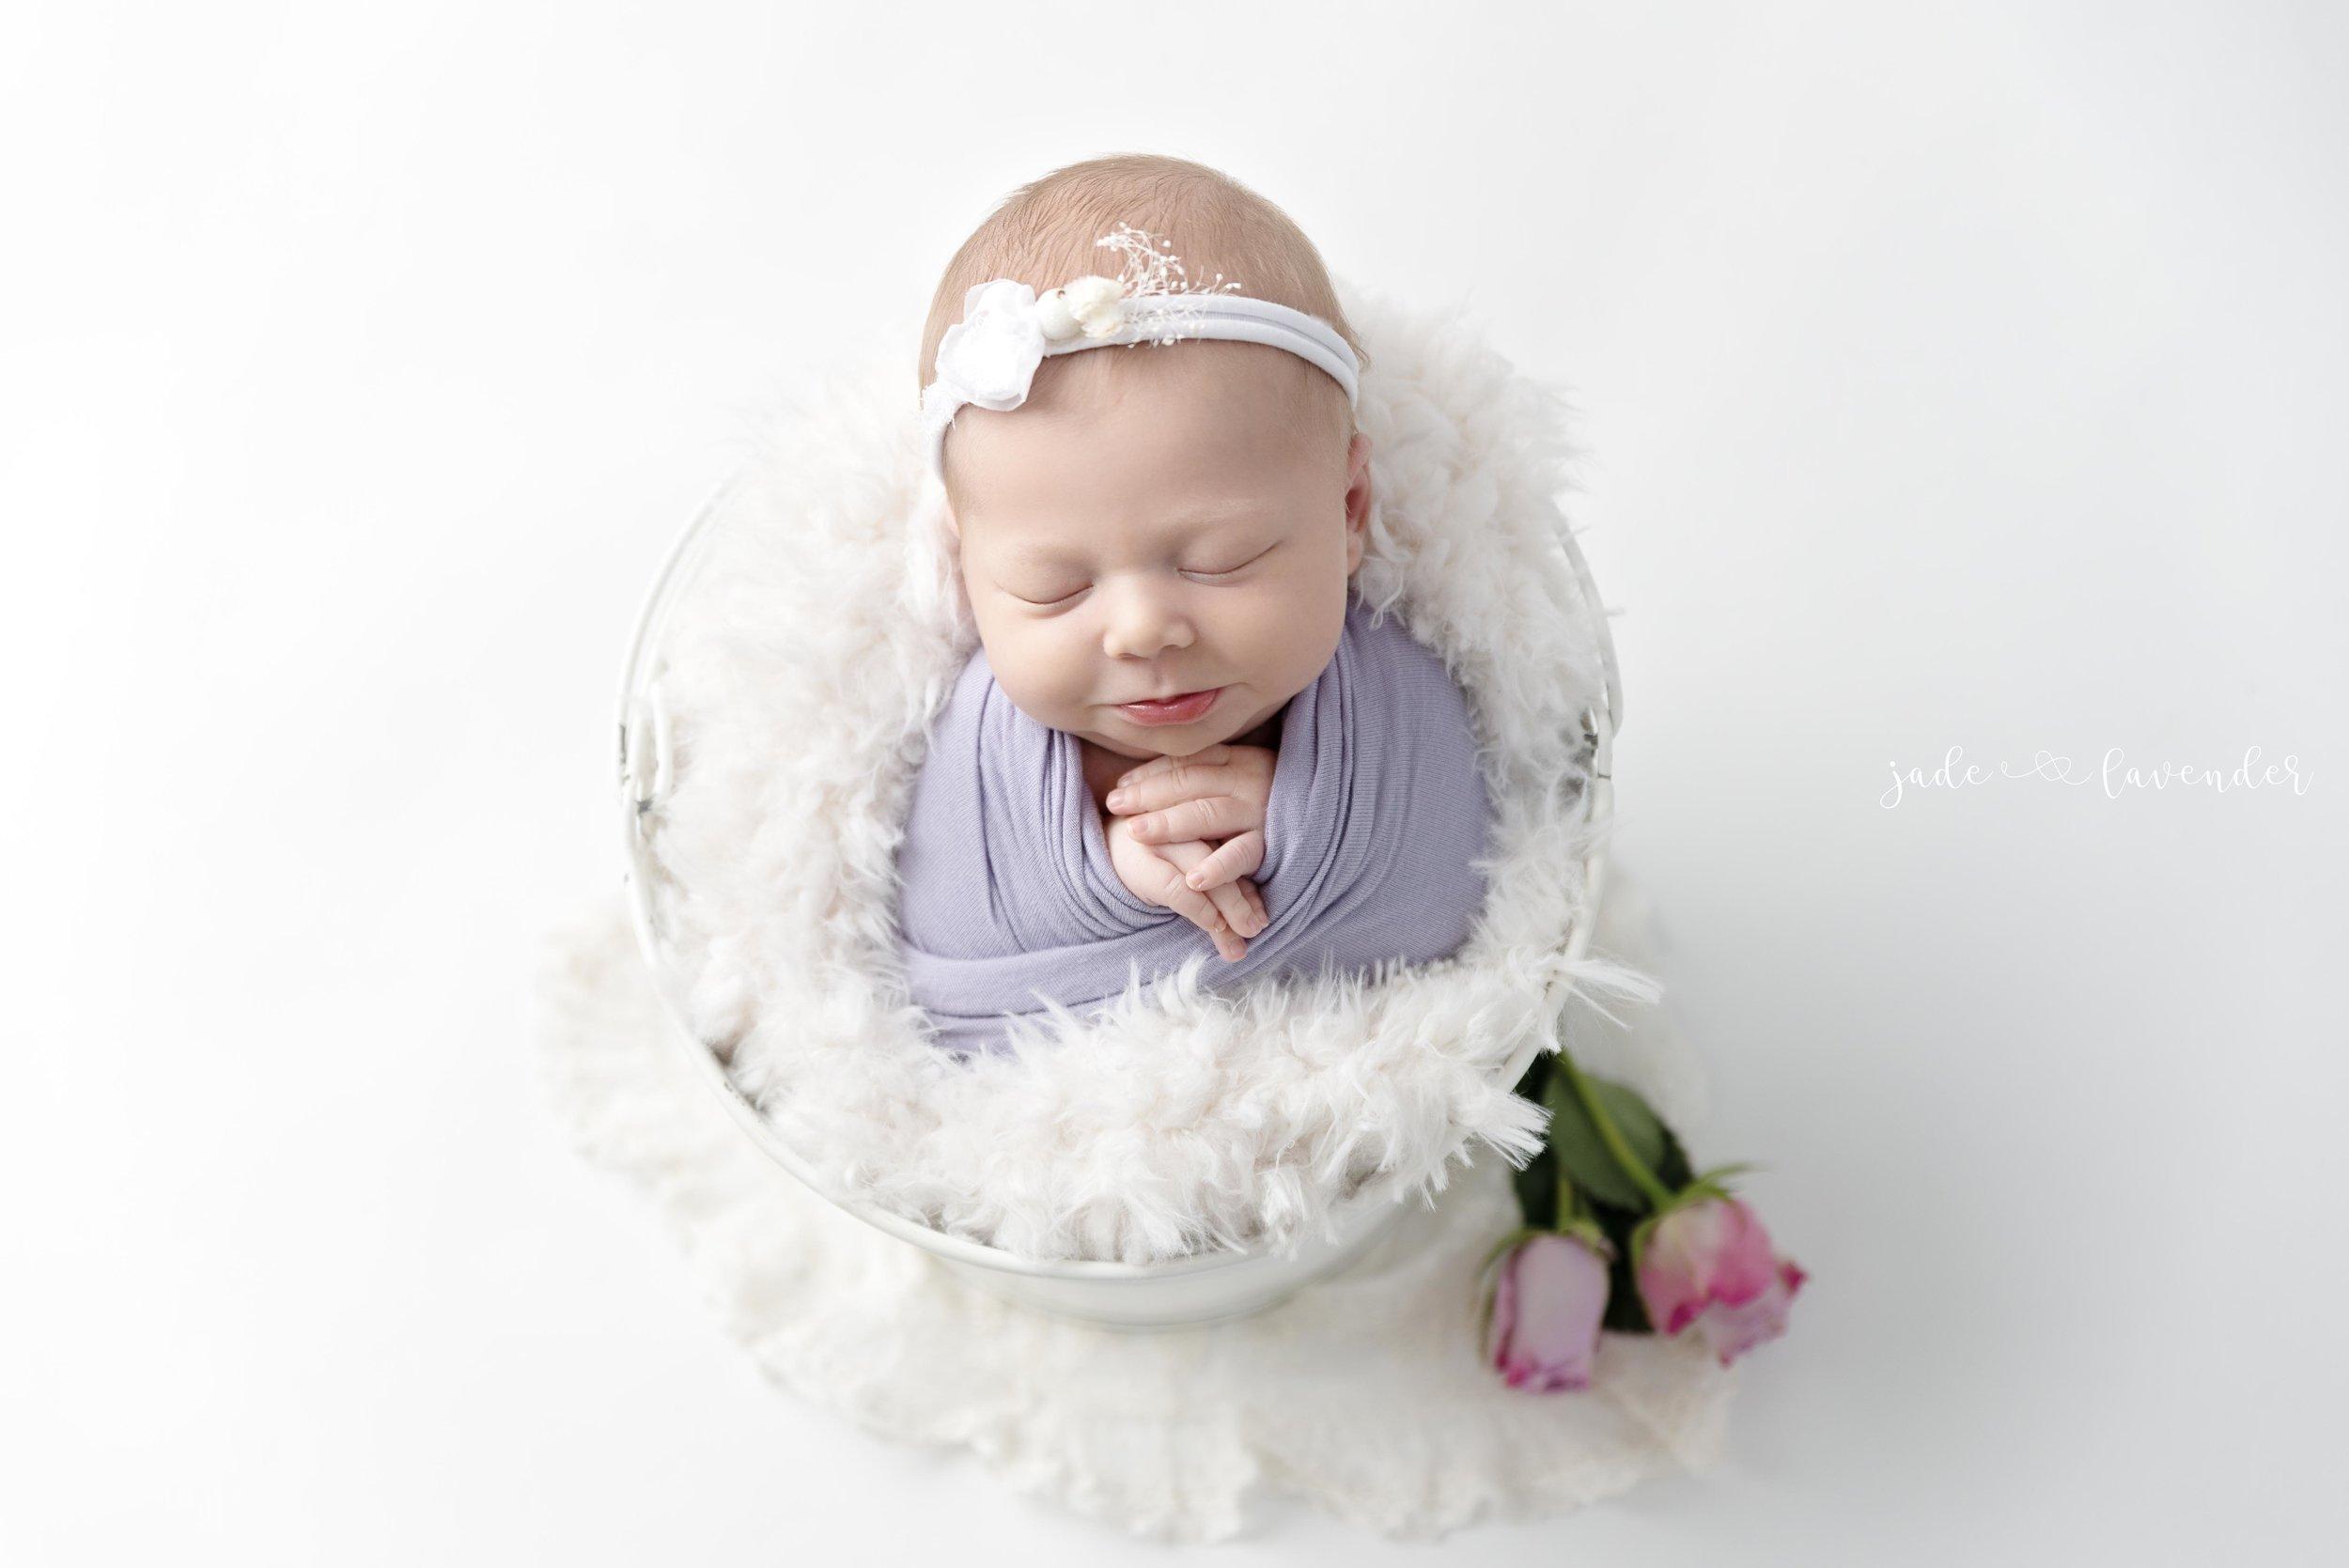 girl-infant-family-photography-baby-photo-studio-newborn-pictures-spokane-washington (6 of 8).jpg